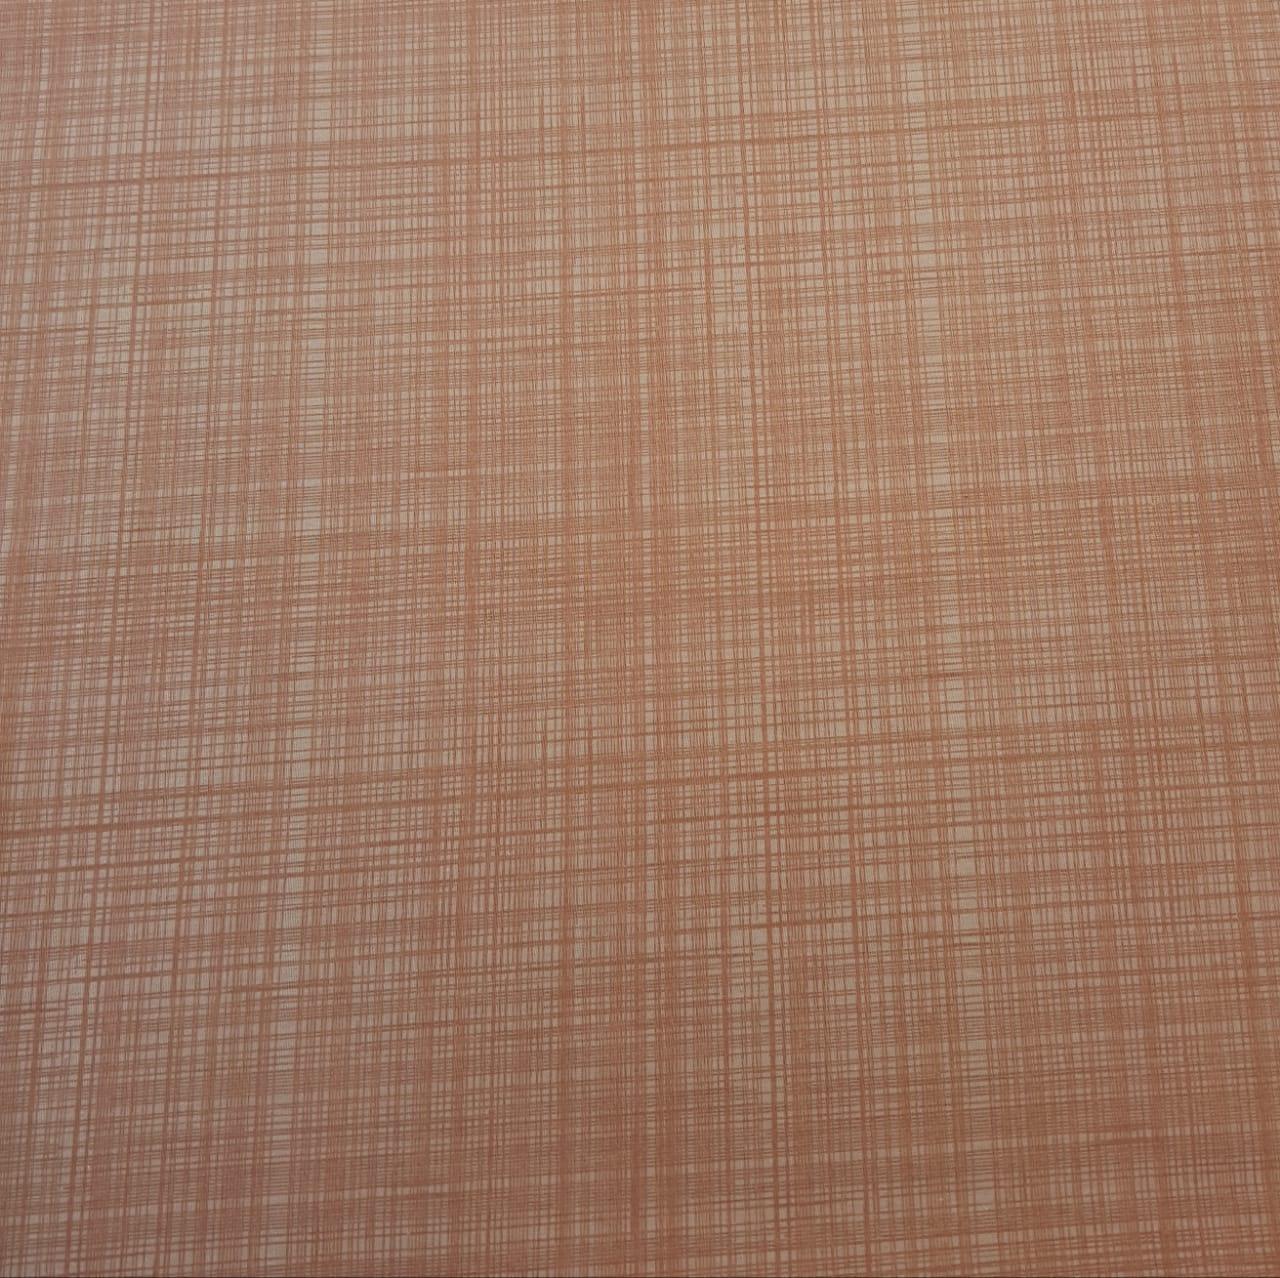 Riscadinho tramas / Rosa goiaba - 50x150cm